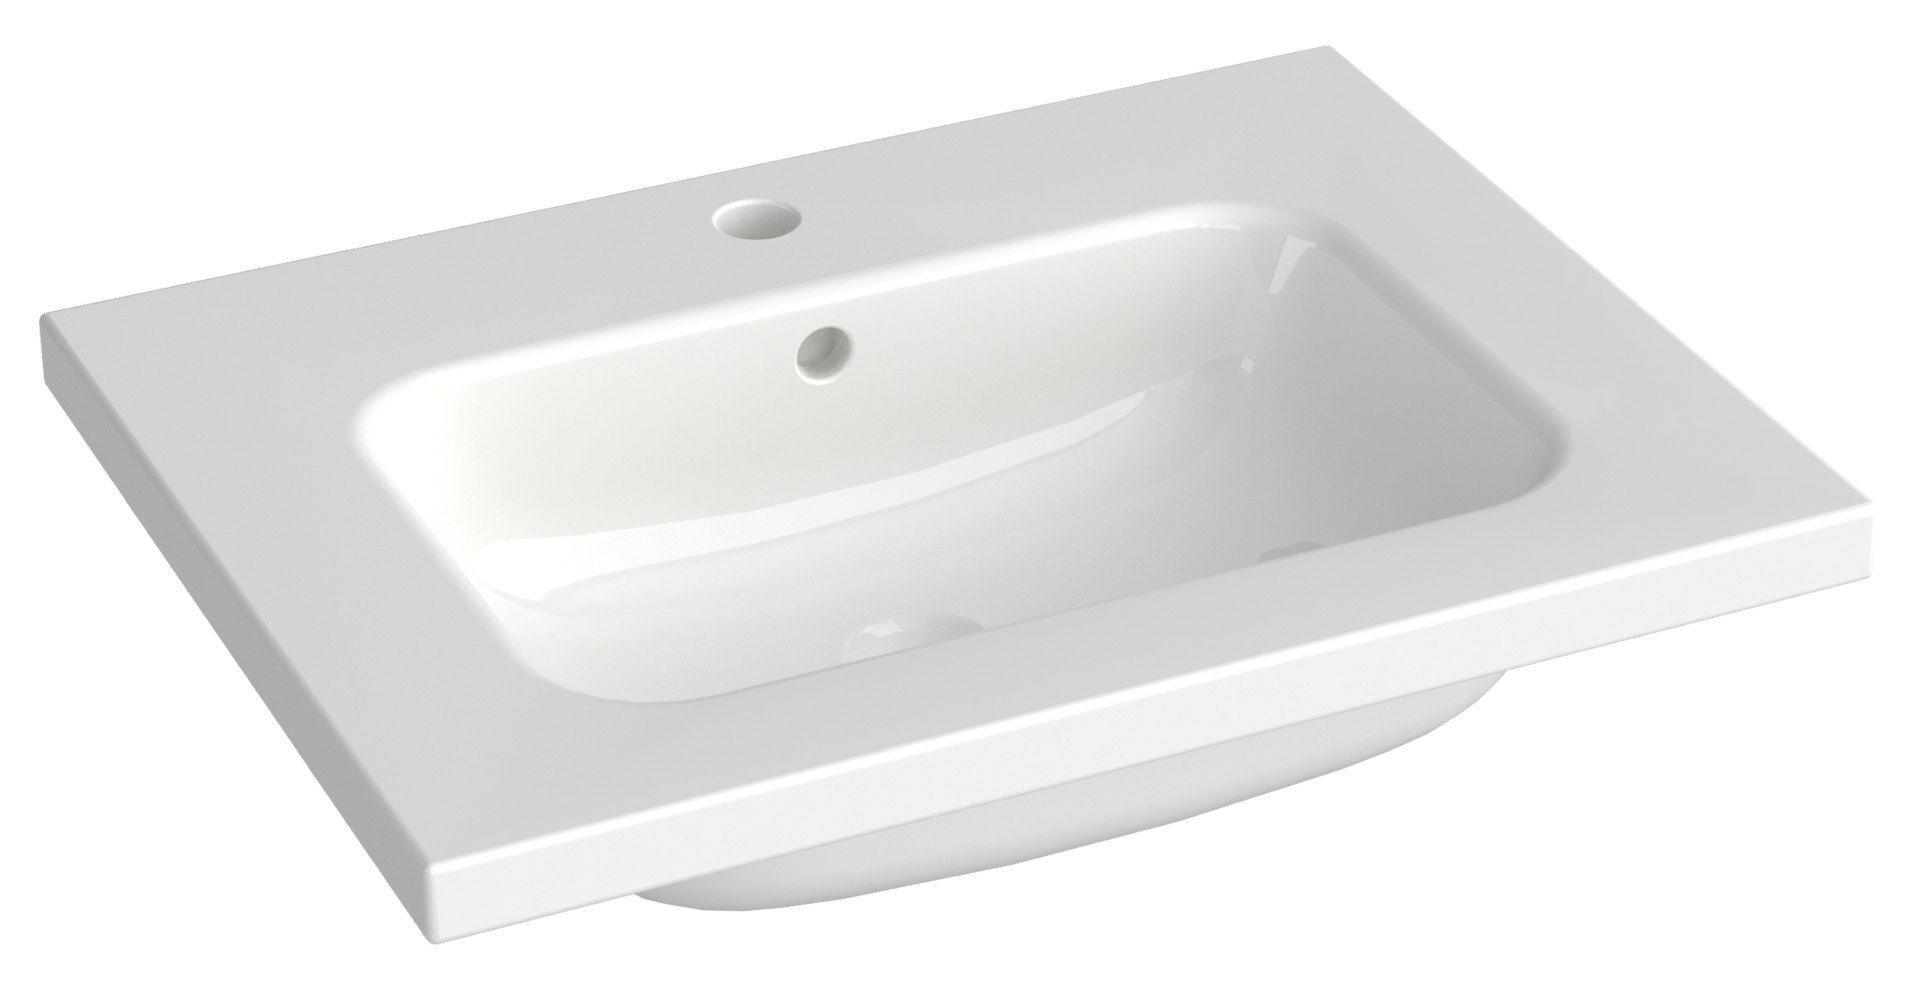 Bad - Waschbecken Dhule 19, Farbe: Weiß – 10 x 61 x 46 cm (H x B x T)